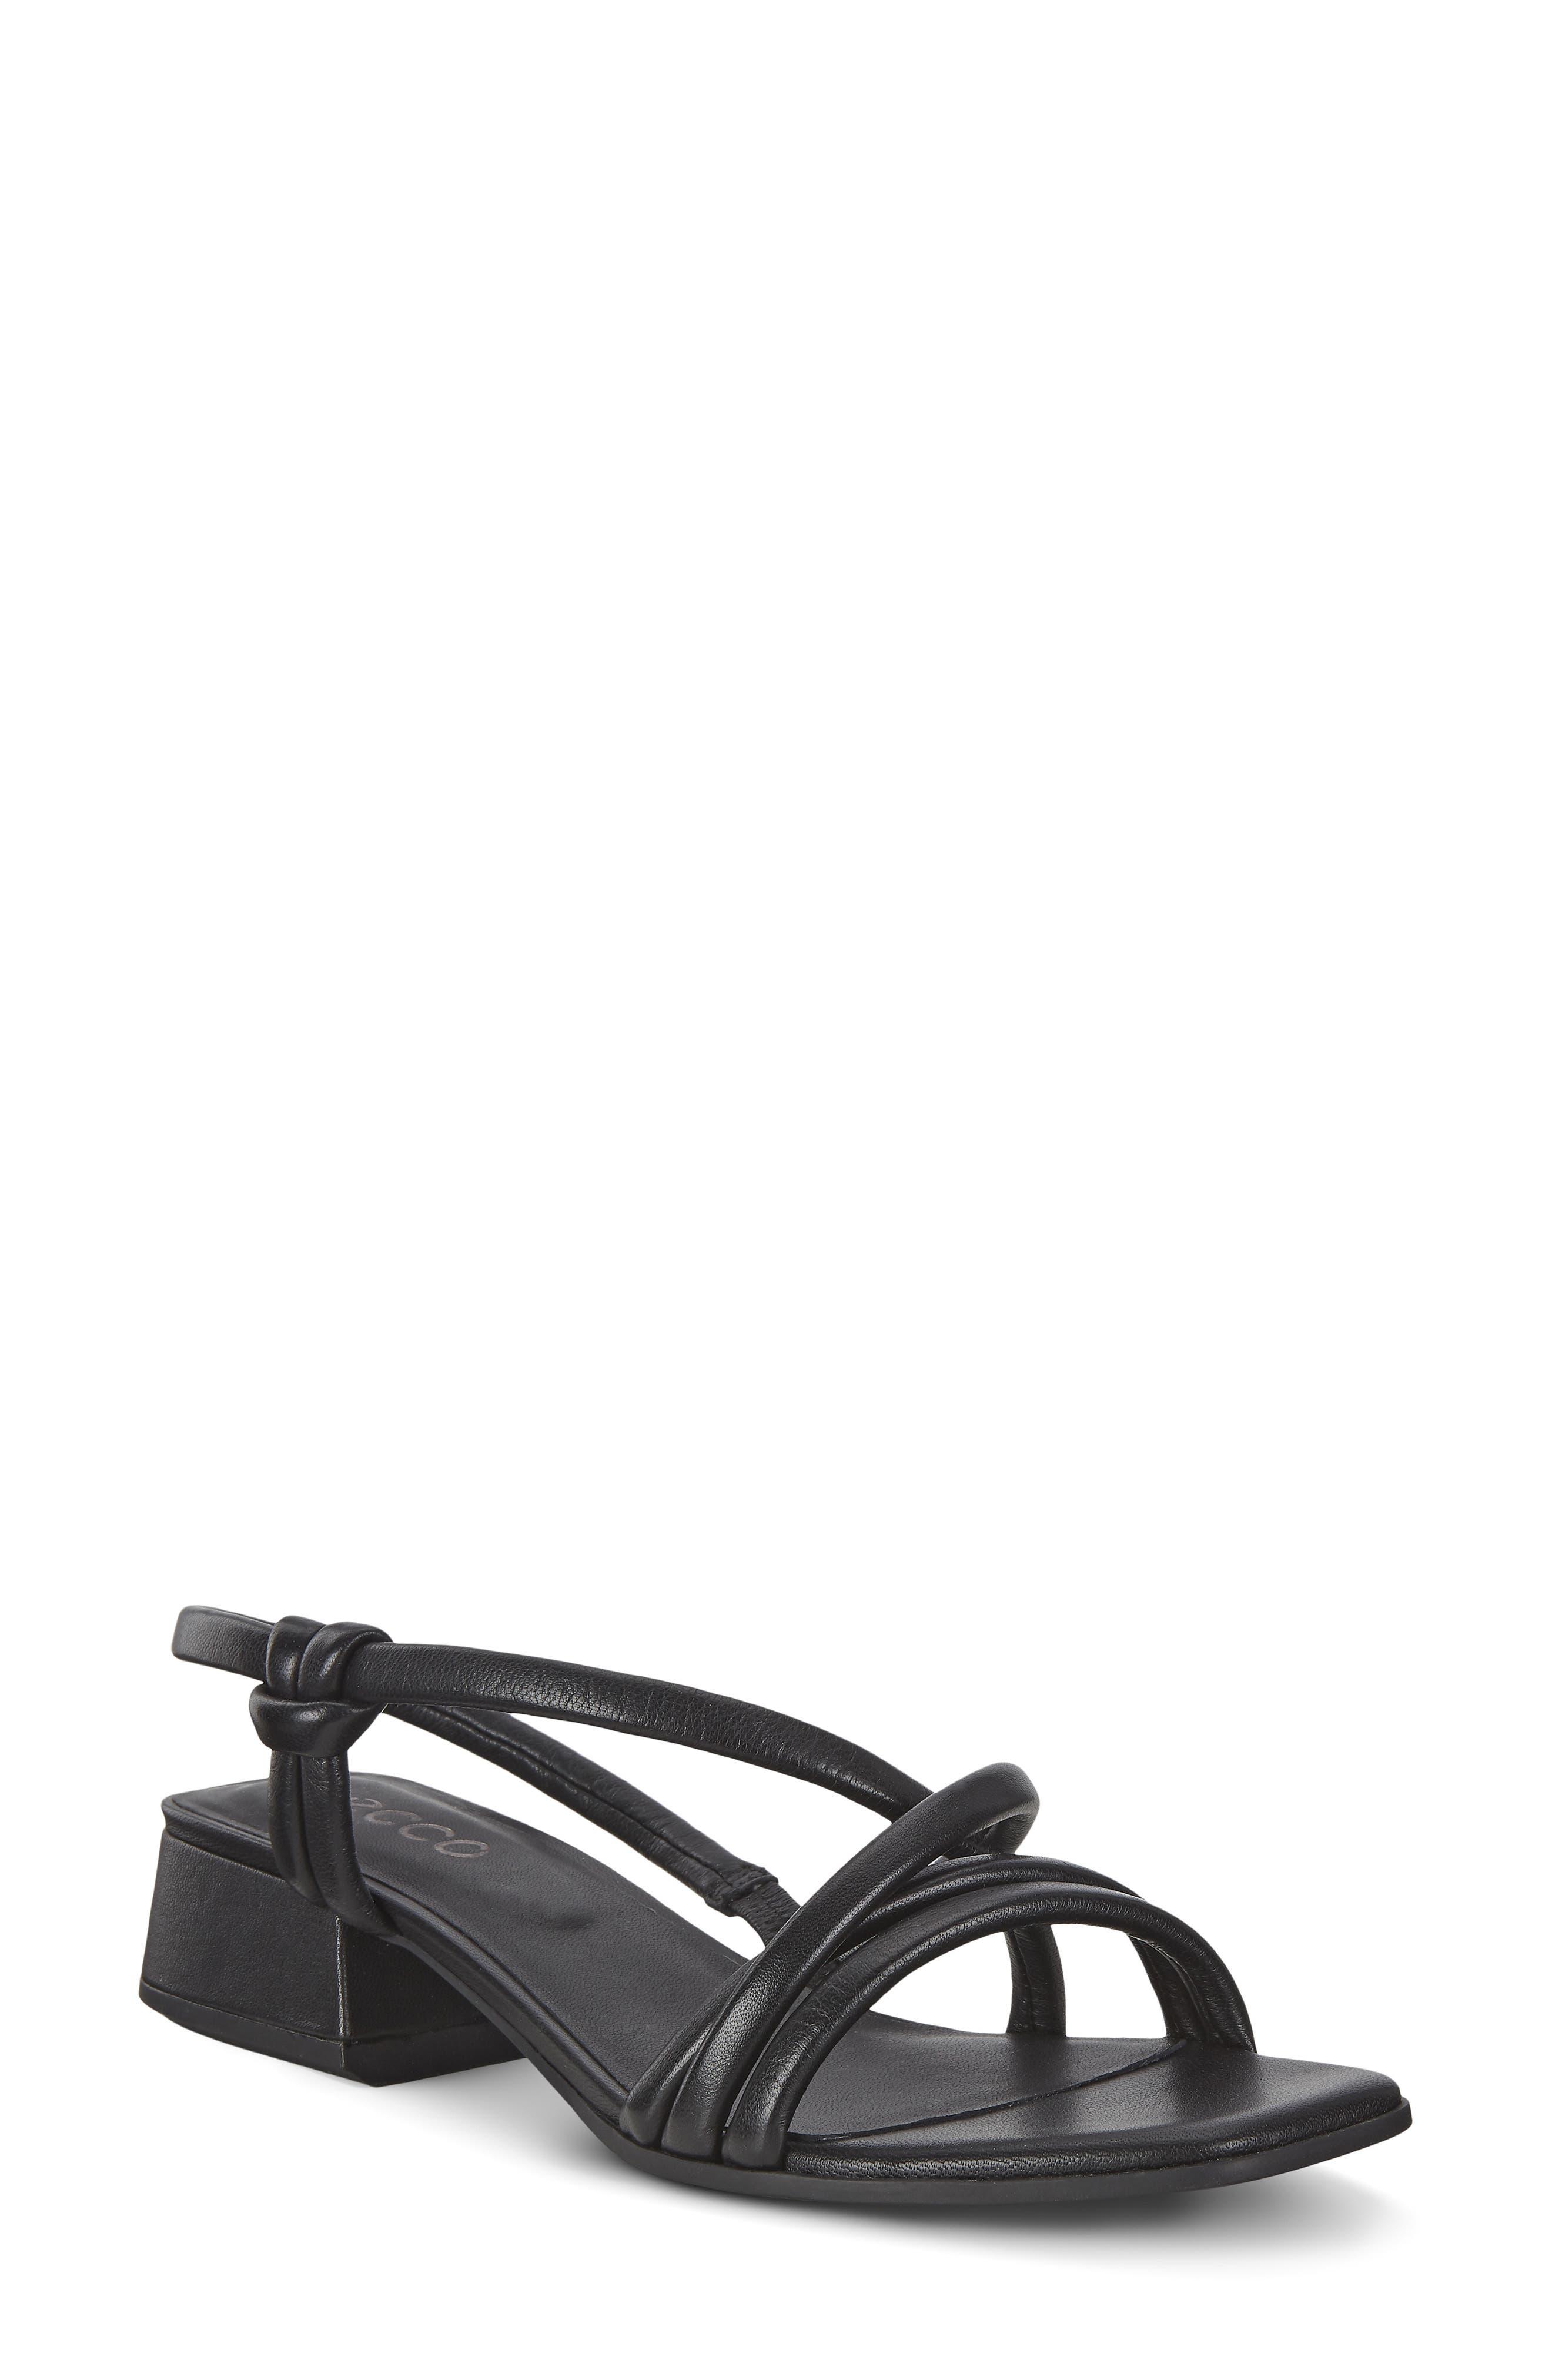 Women's Ecco Elevate Slingback Sandal